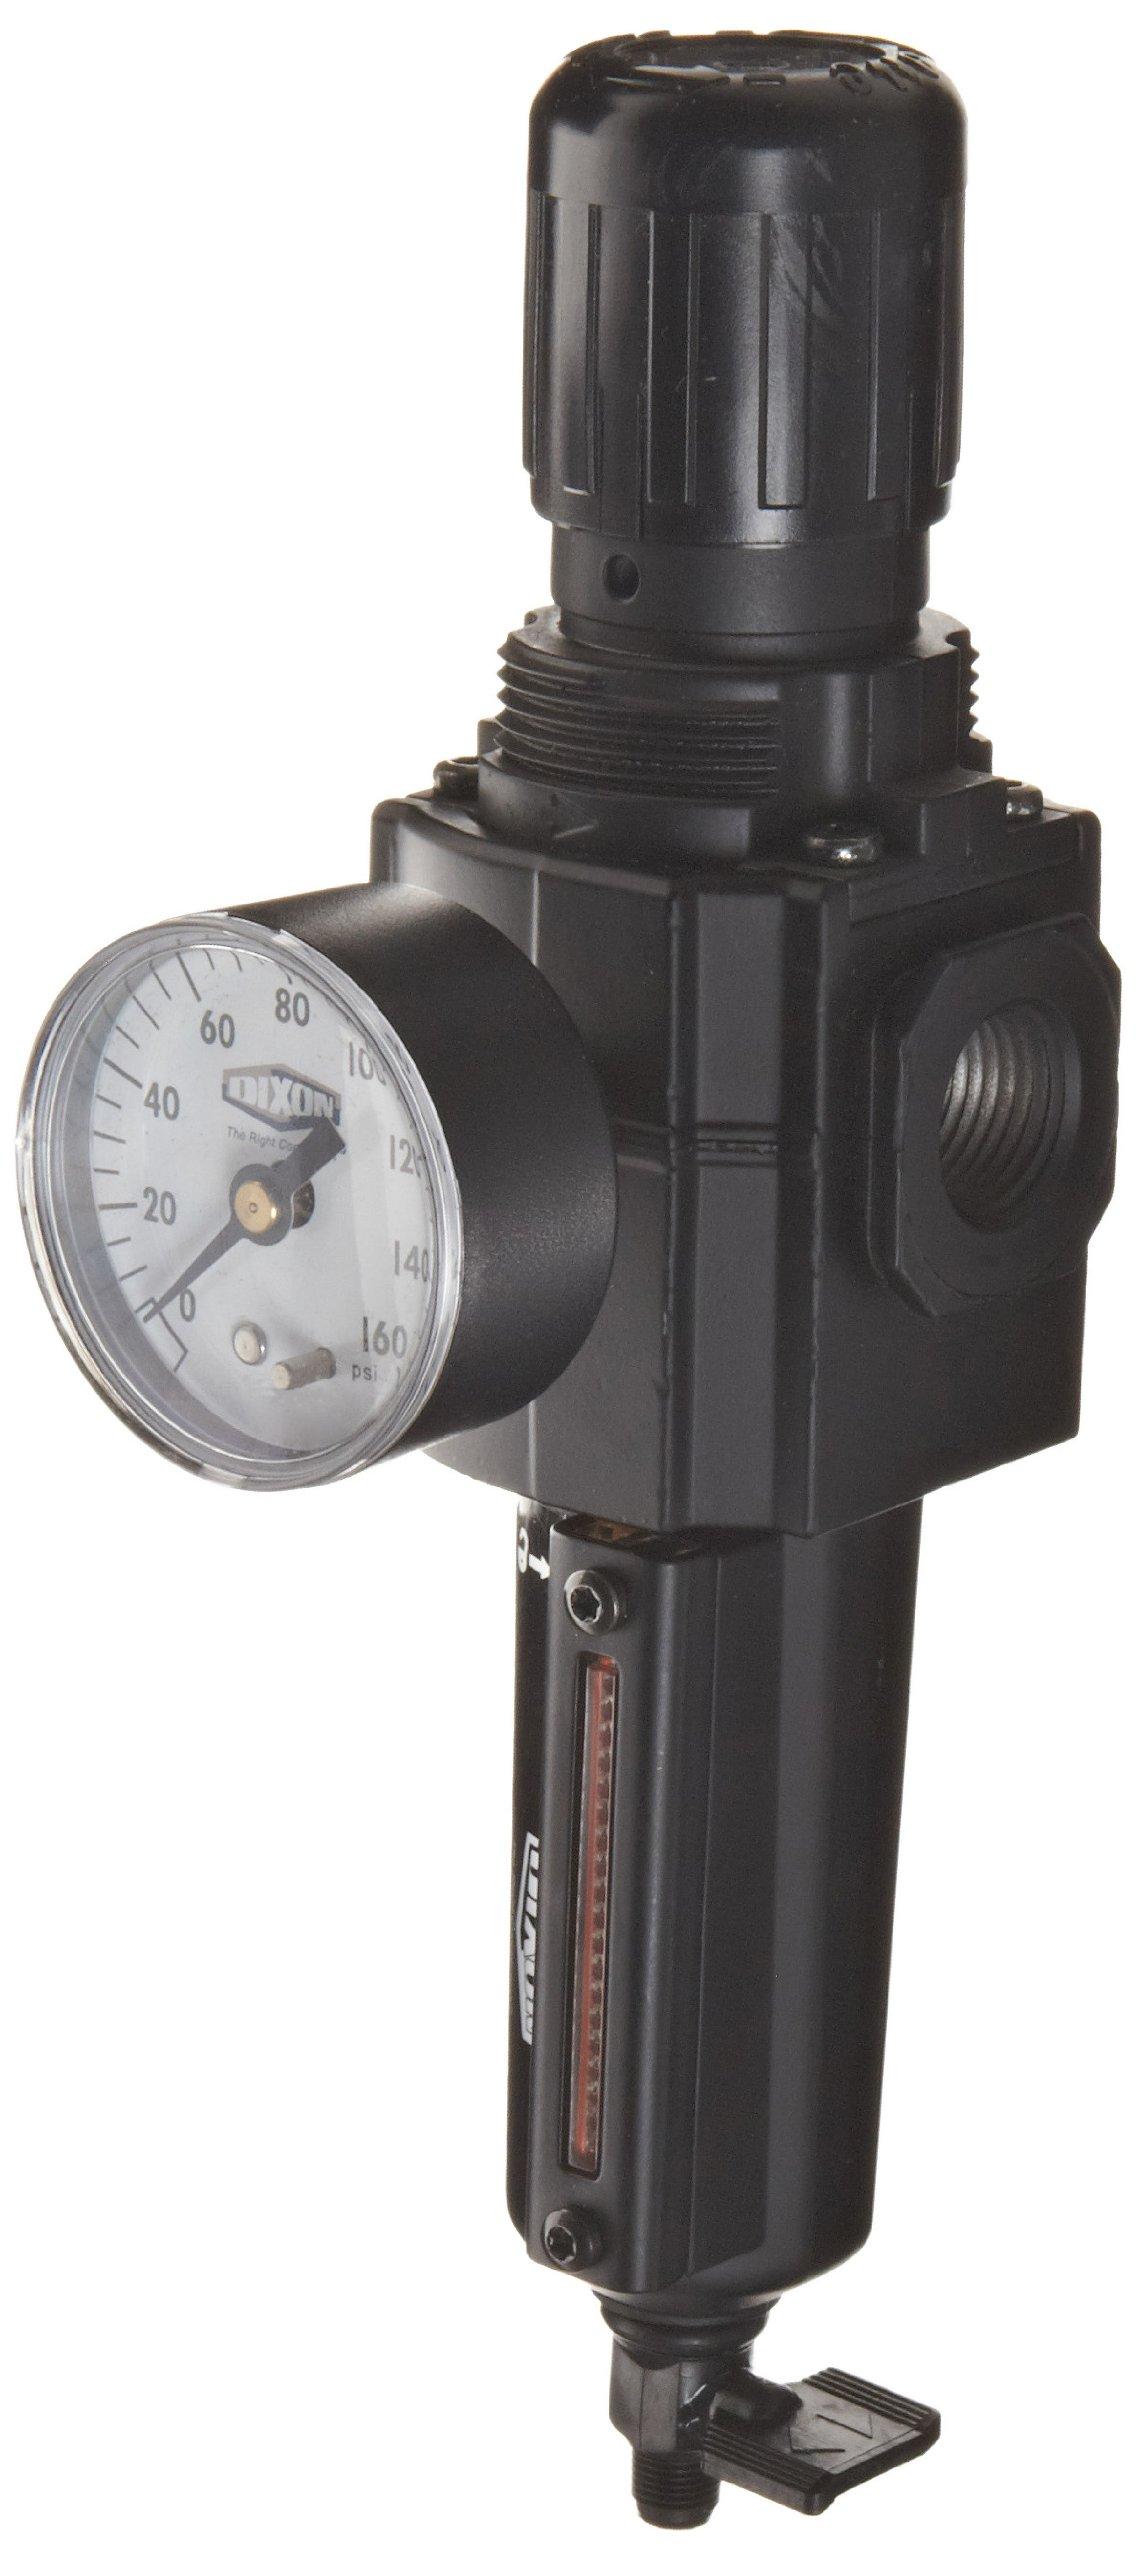 Dixon B73G-4MG-MB Norgren Series Manual Drain Filter/Regulator with Metal Bowl and Sight Glass, 3/8'' Basic, 123 SCFM, 1/2'' Port Size, 5-150 PSI by Dixon Valve & Coupling